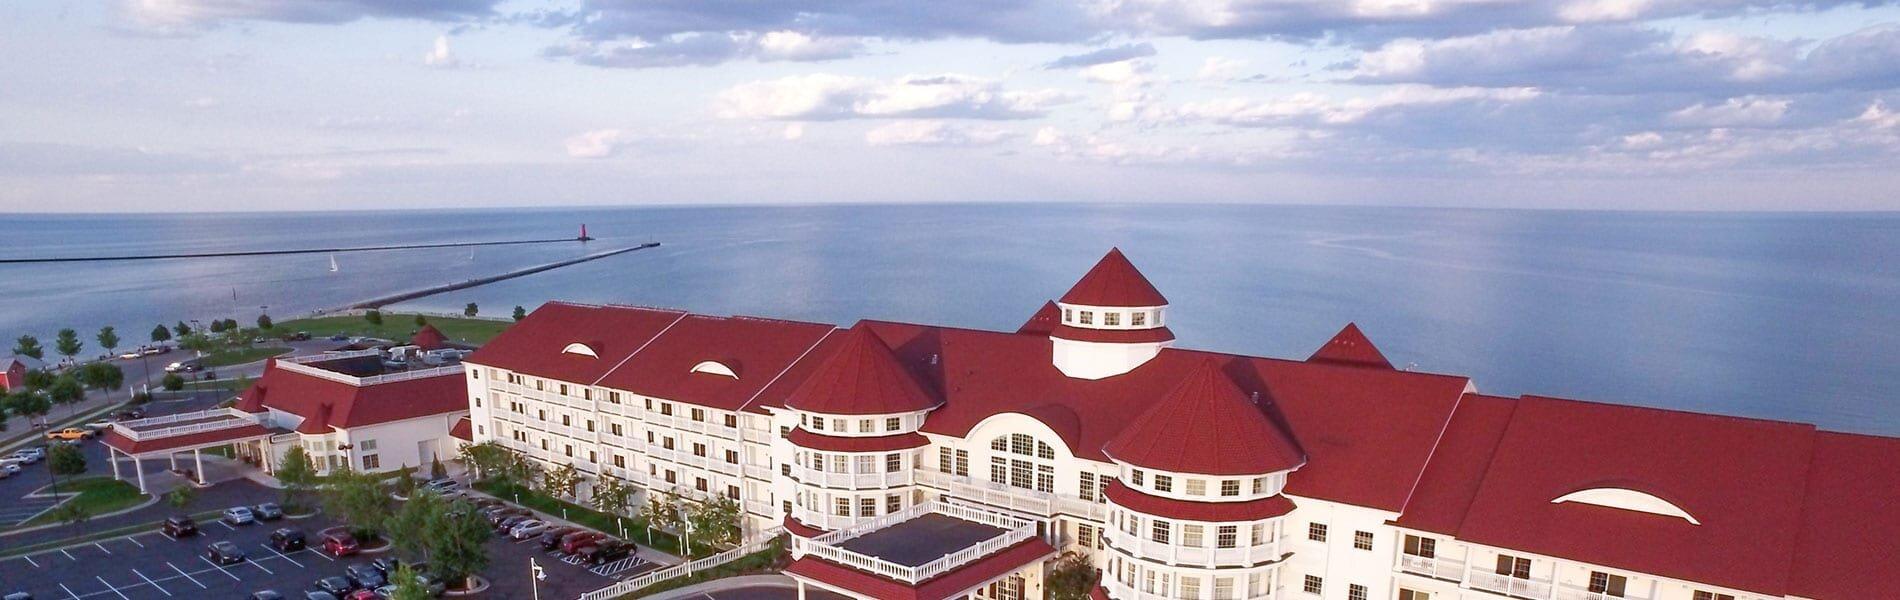 blue harbor resort.jpg